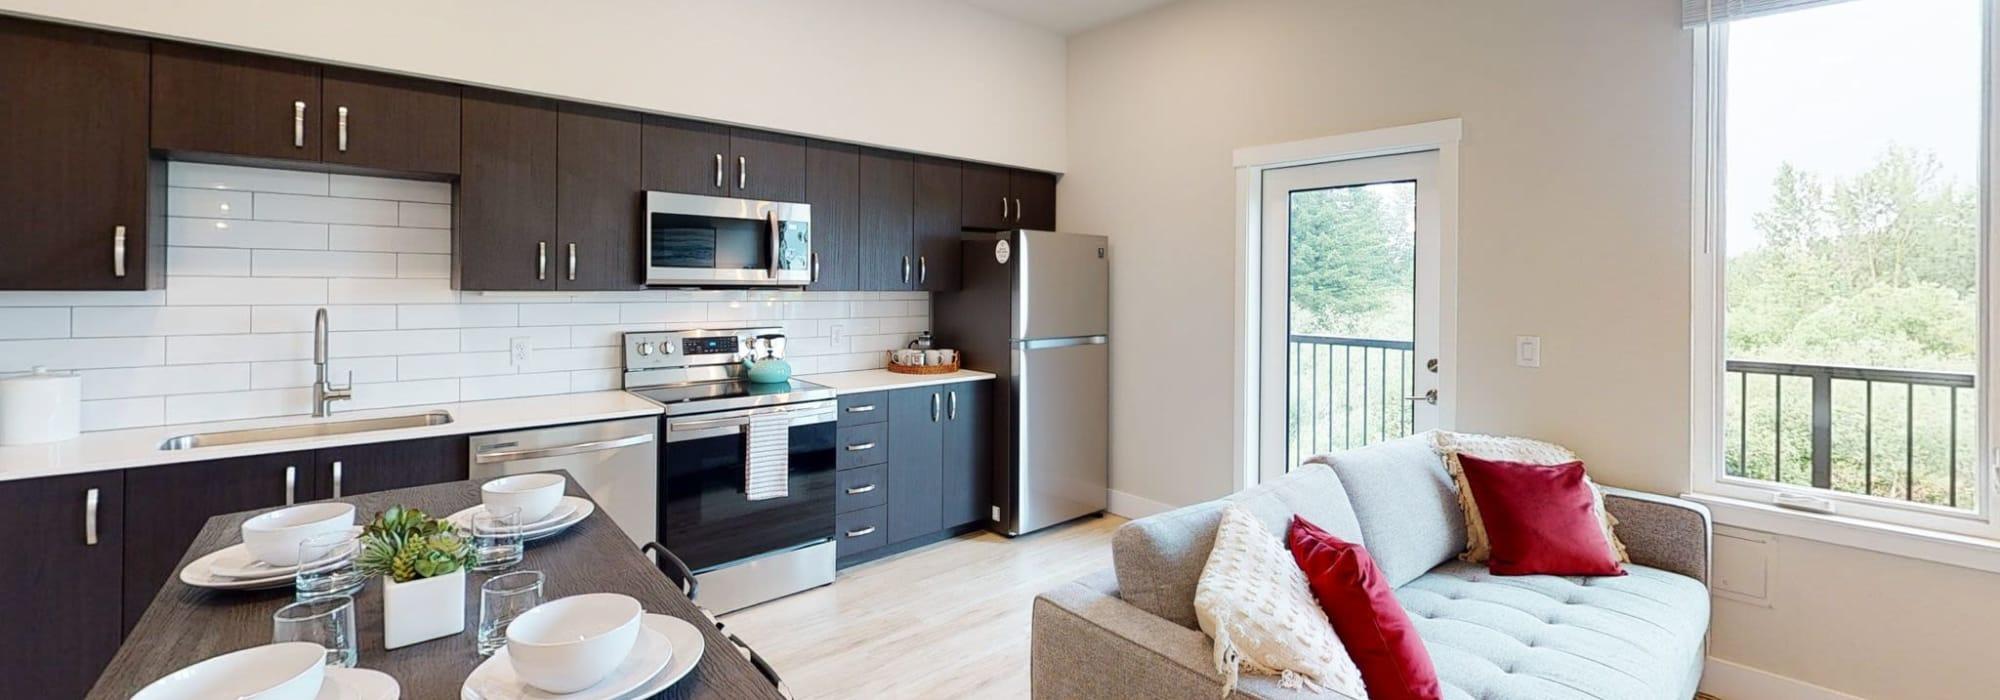 Reviews at Brookside Apartments in Gresham, Oregon